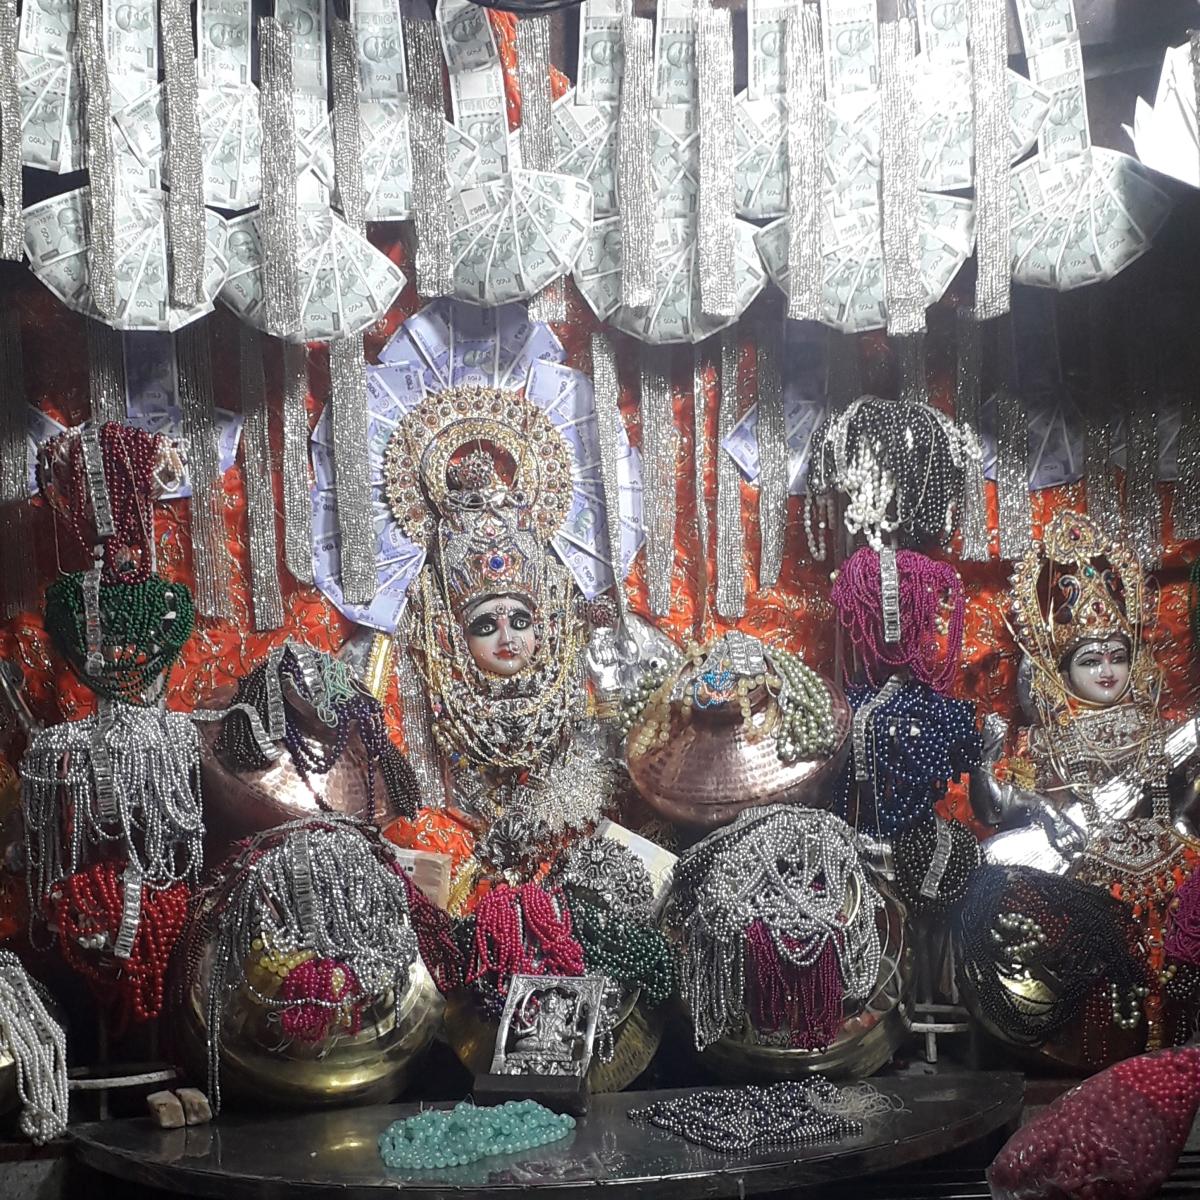 Ratlam: Mahalaxmi Mandir –Devotees receive 'precious prasad' on Diwali